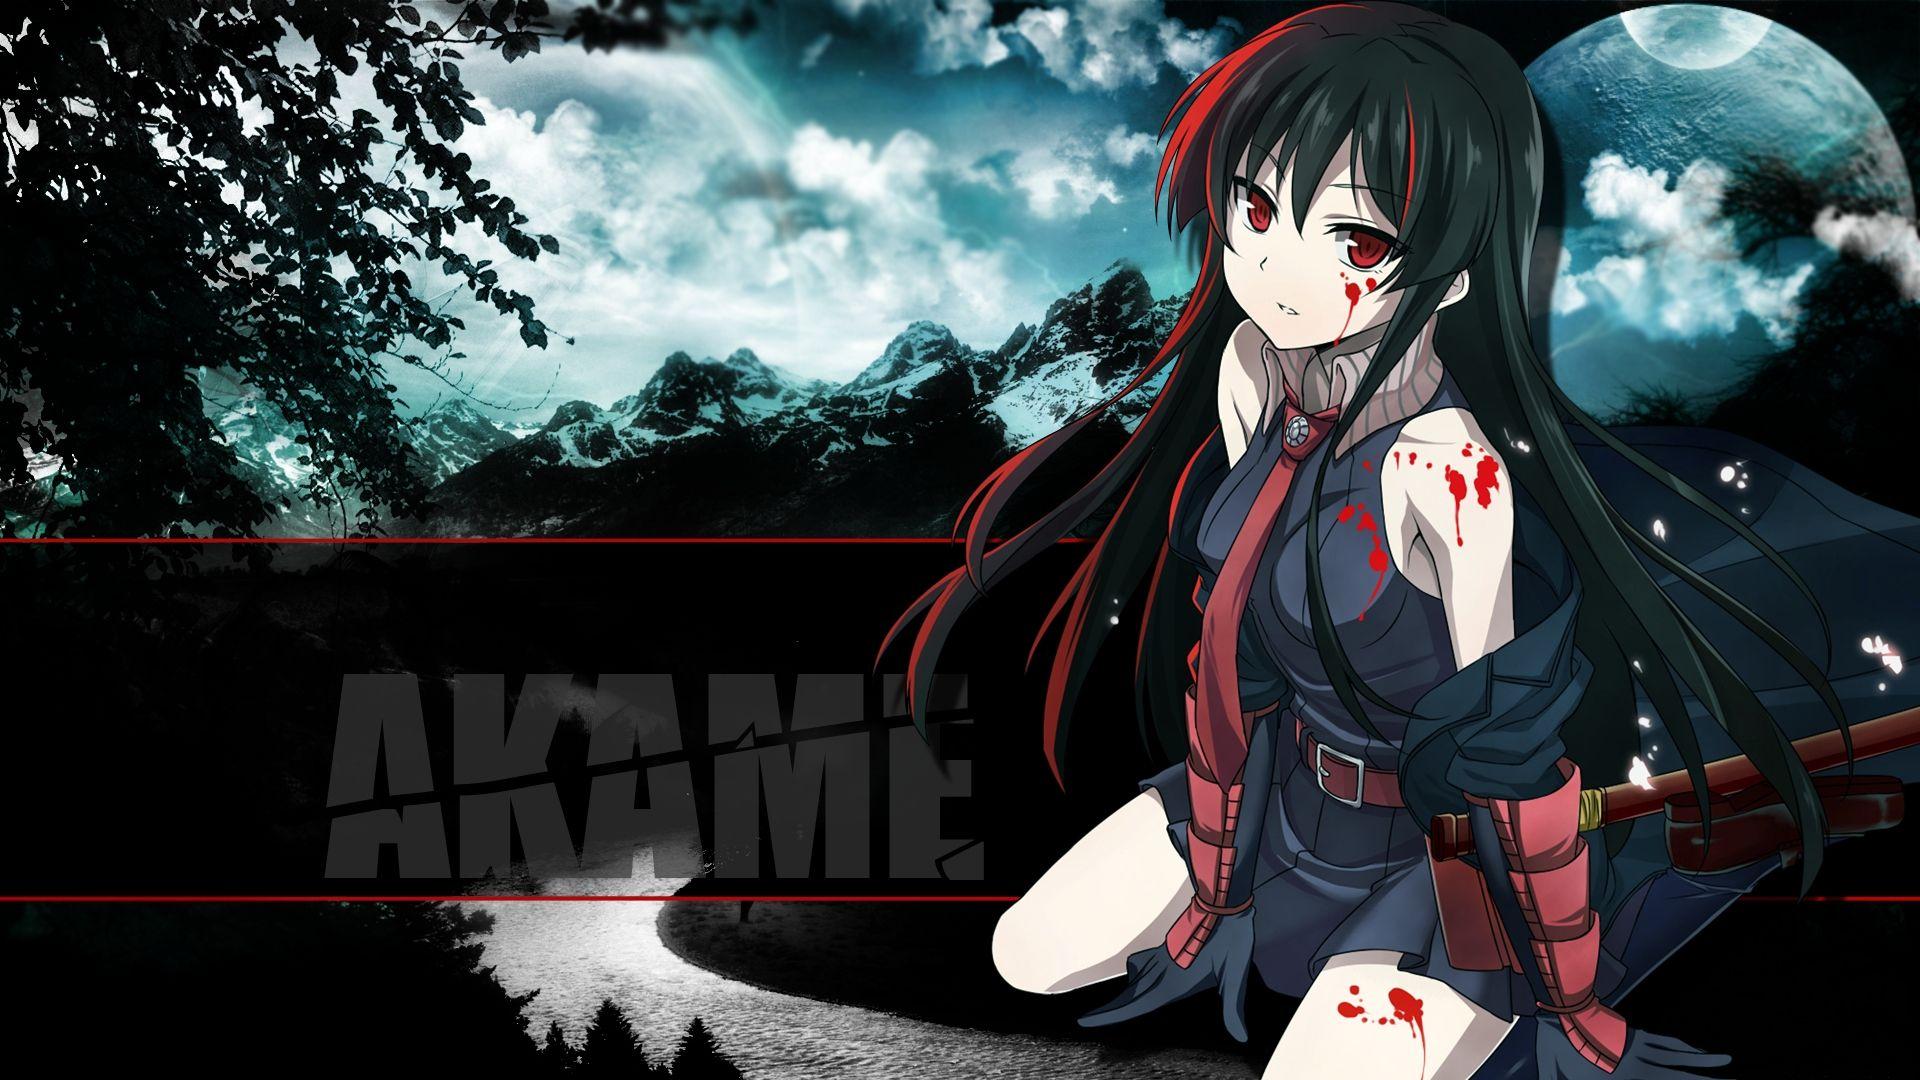 10 New Akame Ga Kill Wallpaper Hd Full Hd 1080p For Pc Desktop Akame Ga Kill Akame Ga Anime Wallpaper